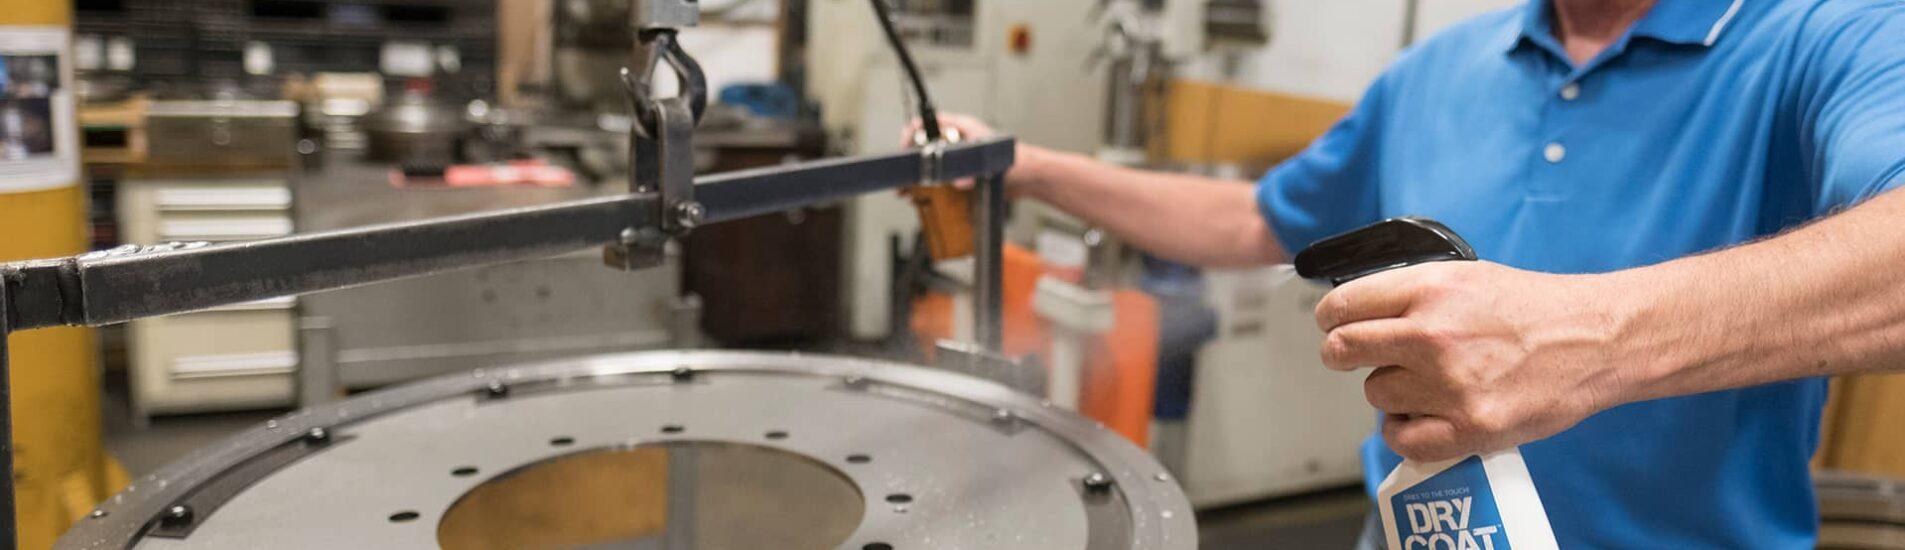 Worker spraying Dry Coat Rust Preventative on gear